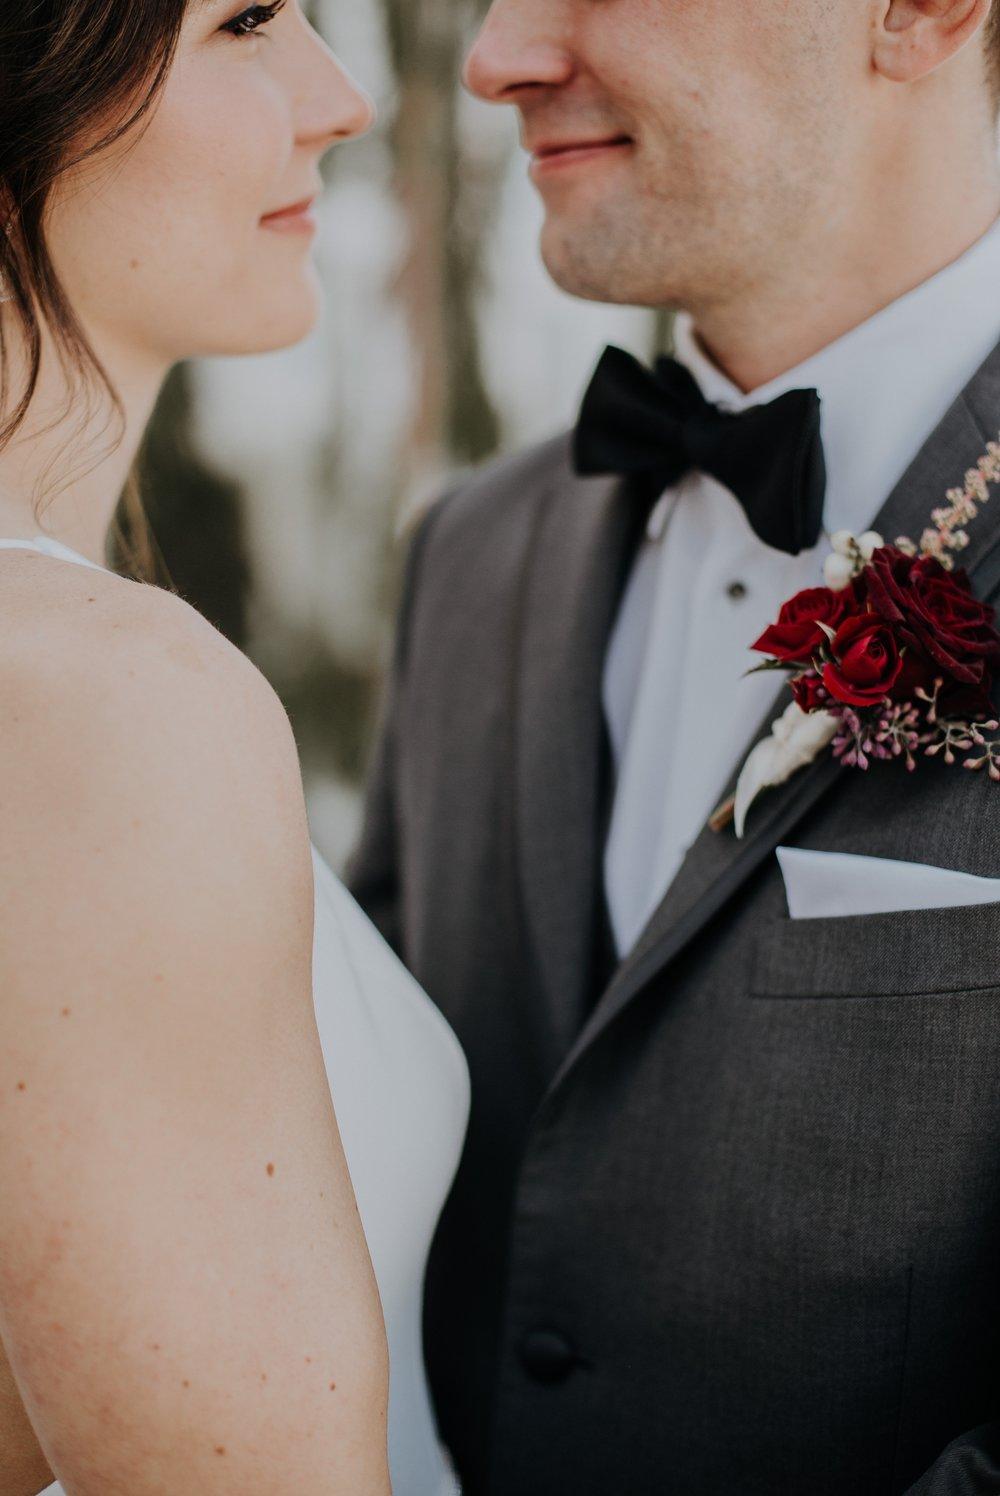 Sarah_Anne_Photography_Dairyland_Seattle_Wedding 14.jpg